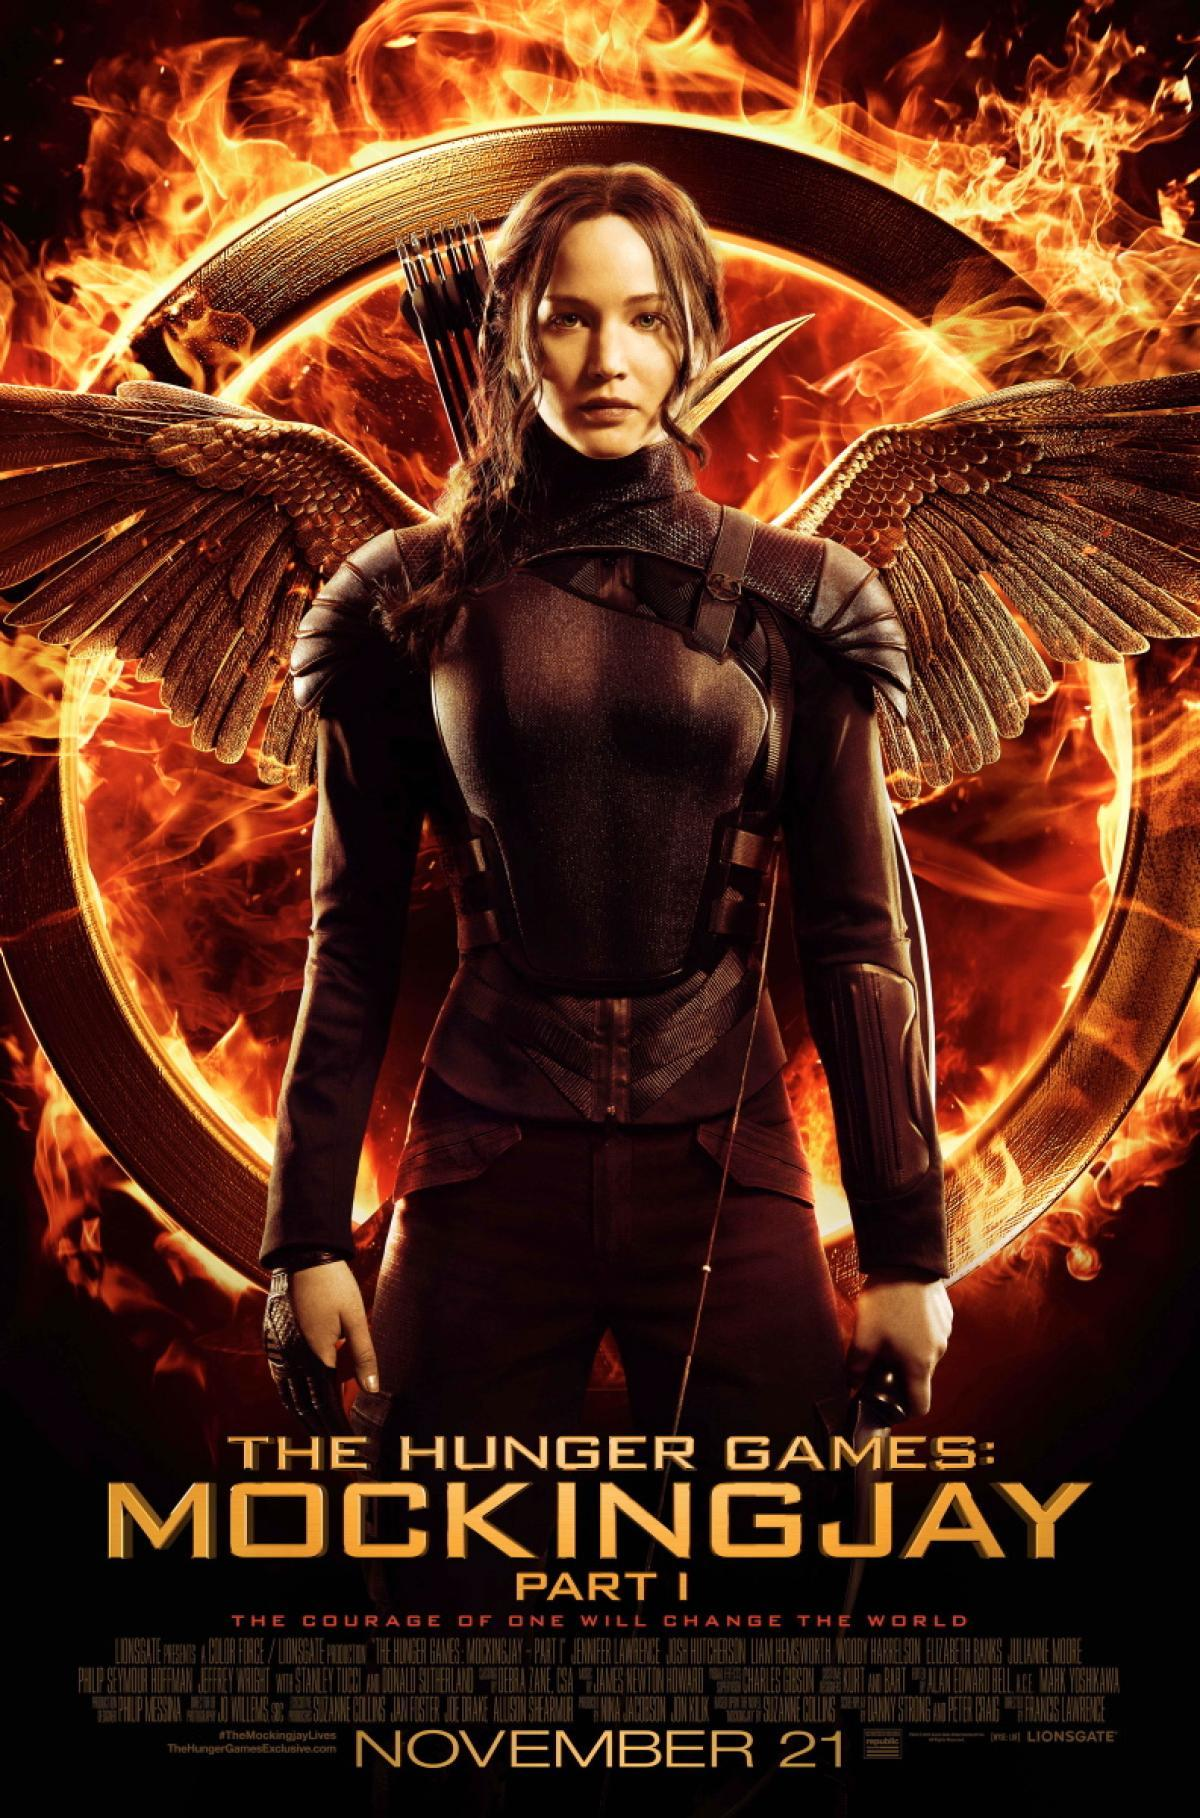 Jennifer Lawrence plays Katniss in